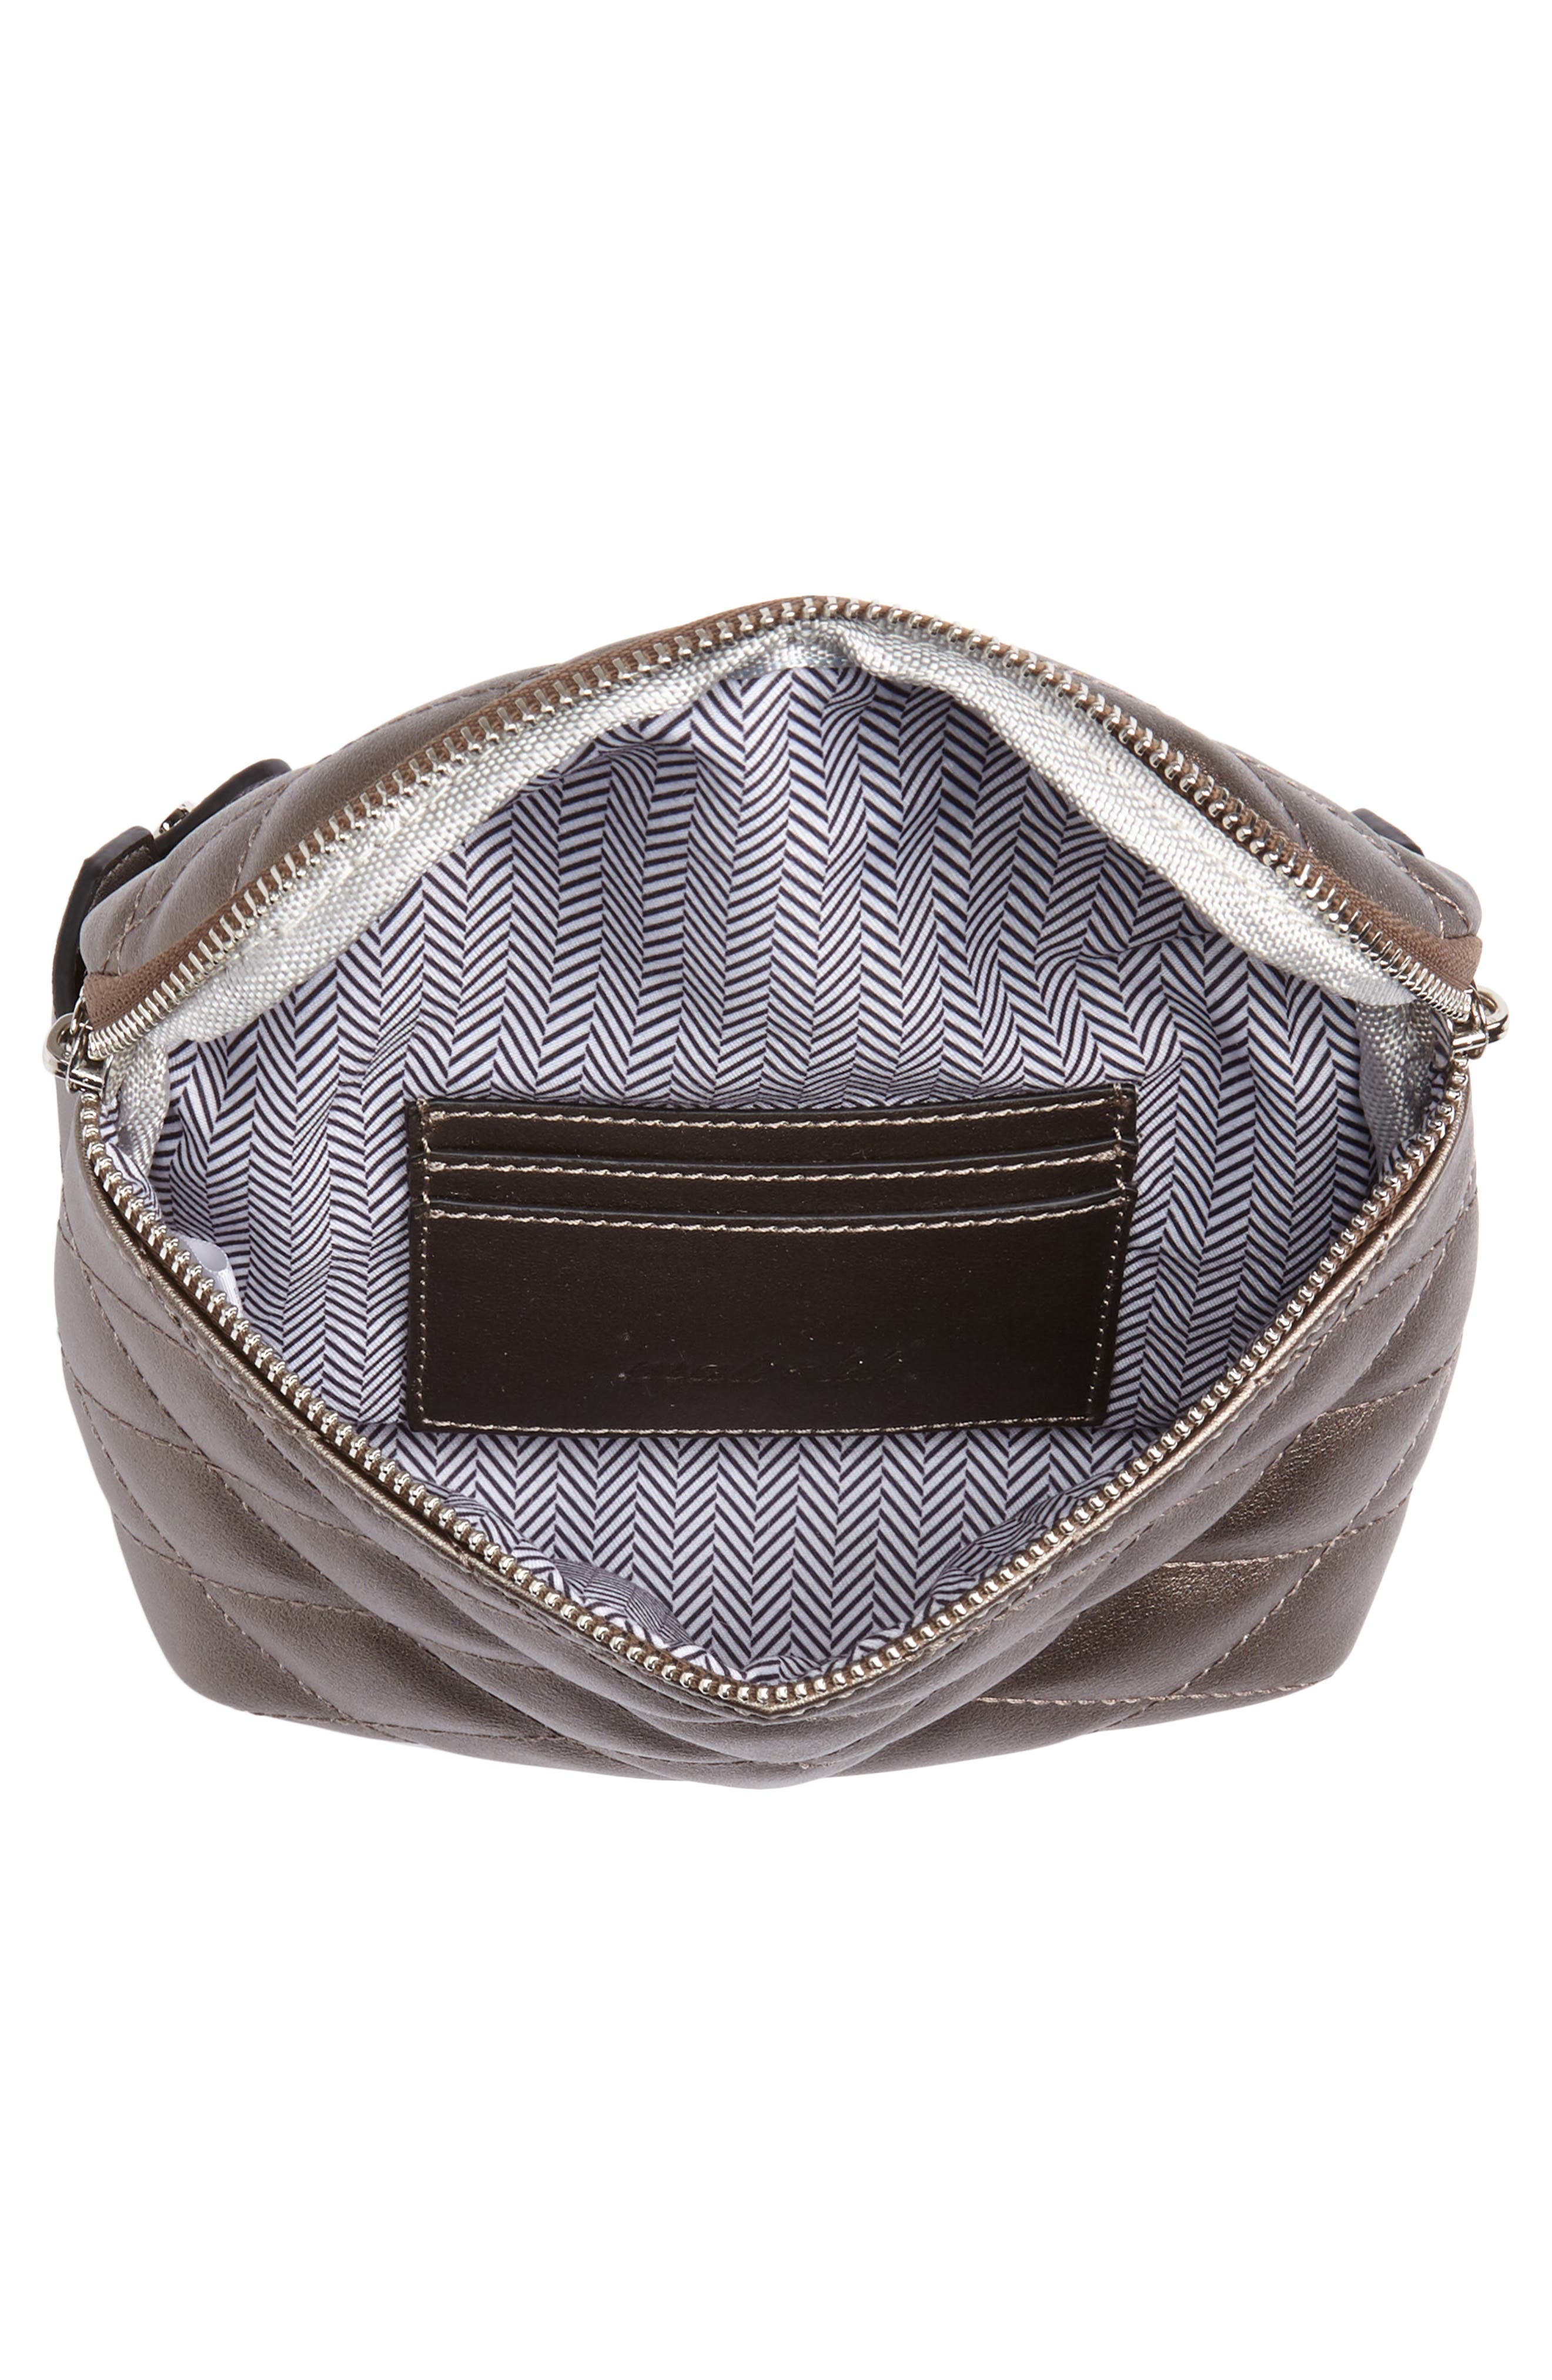 MALI + LILI,                             Faye Vegan Leather Quilted Belt Bag,                             Alternate thumbnail 5, color,                             PEWTER